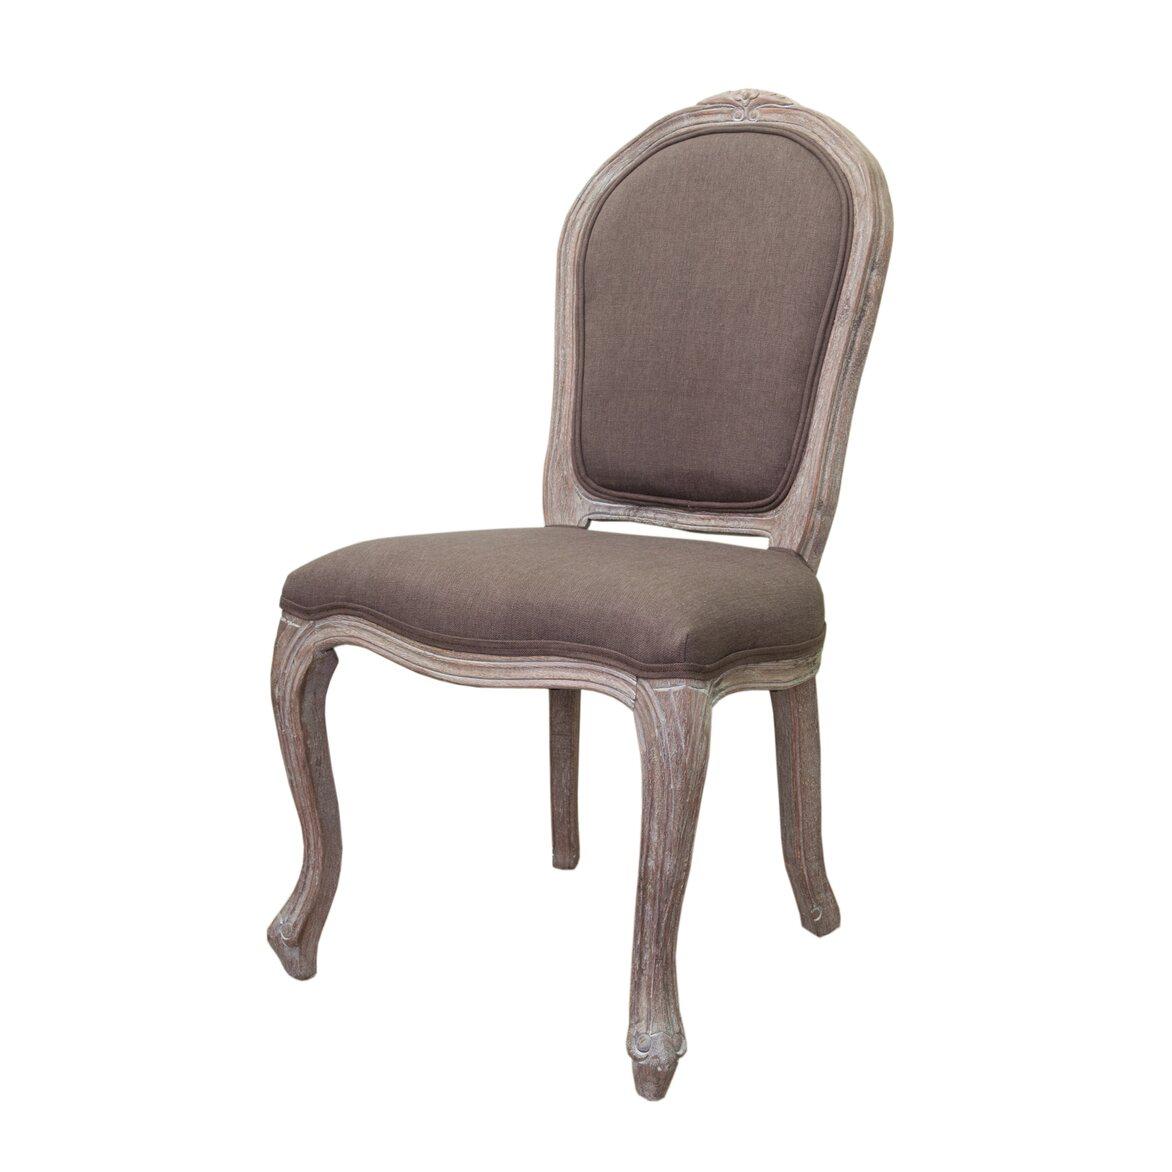 Стул Grand brown 4 | Обеденные стулья Kingsby